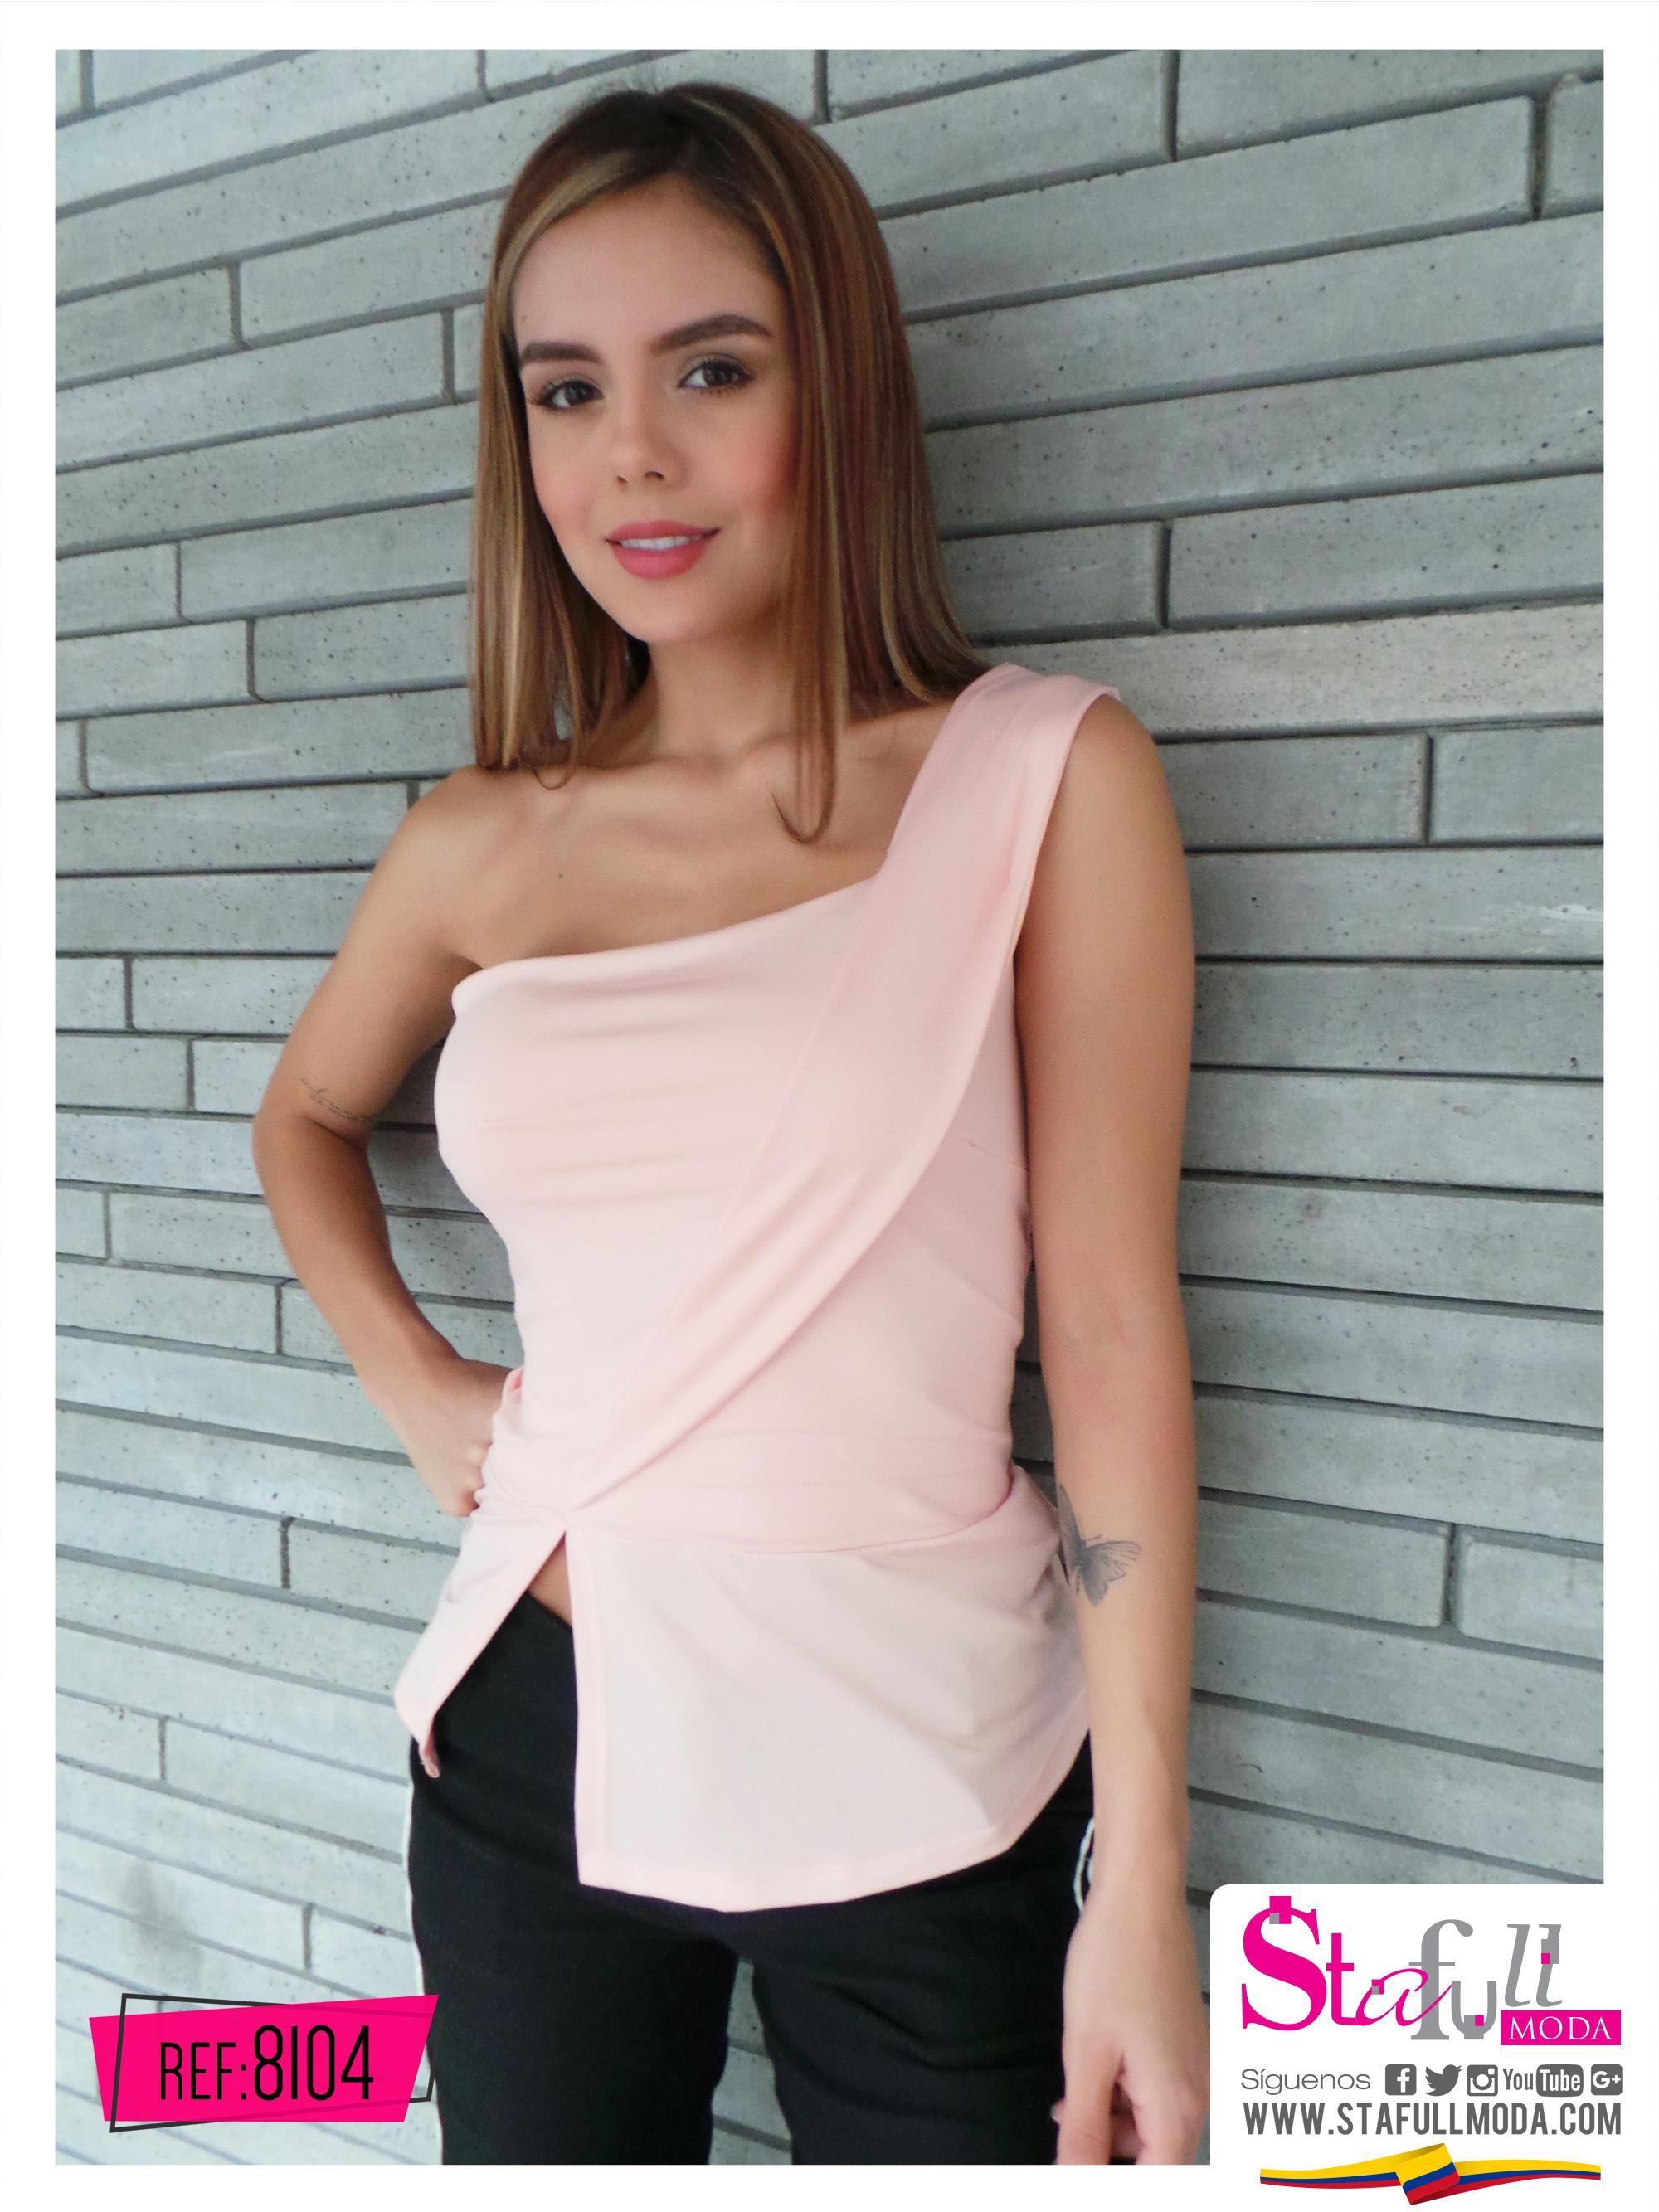 Hermosa Blusa Colombiana Manga corta hombro descubierto